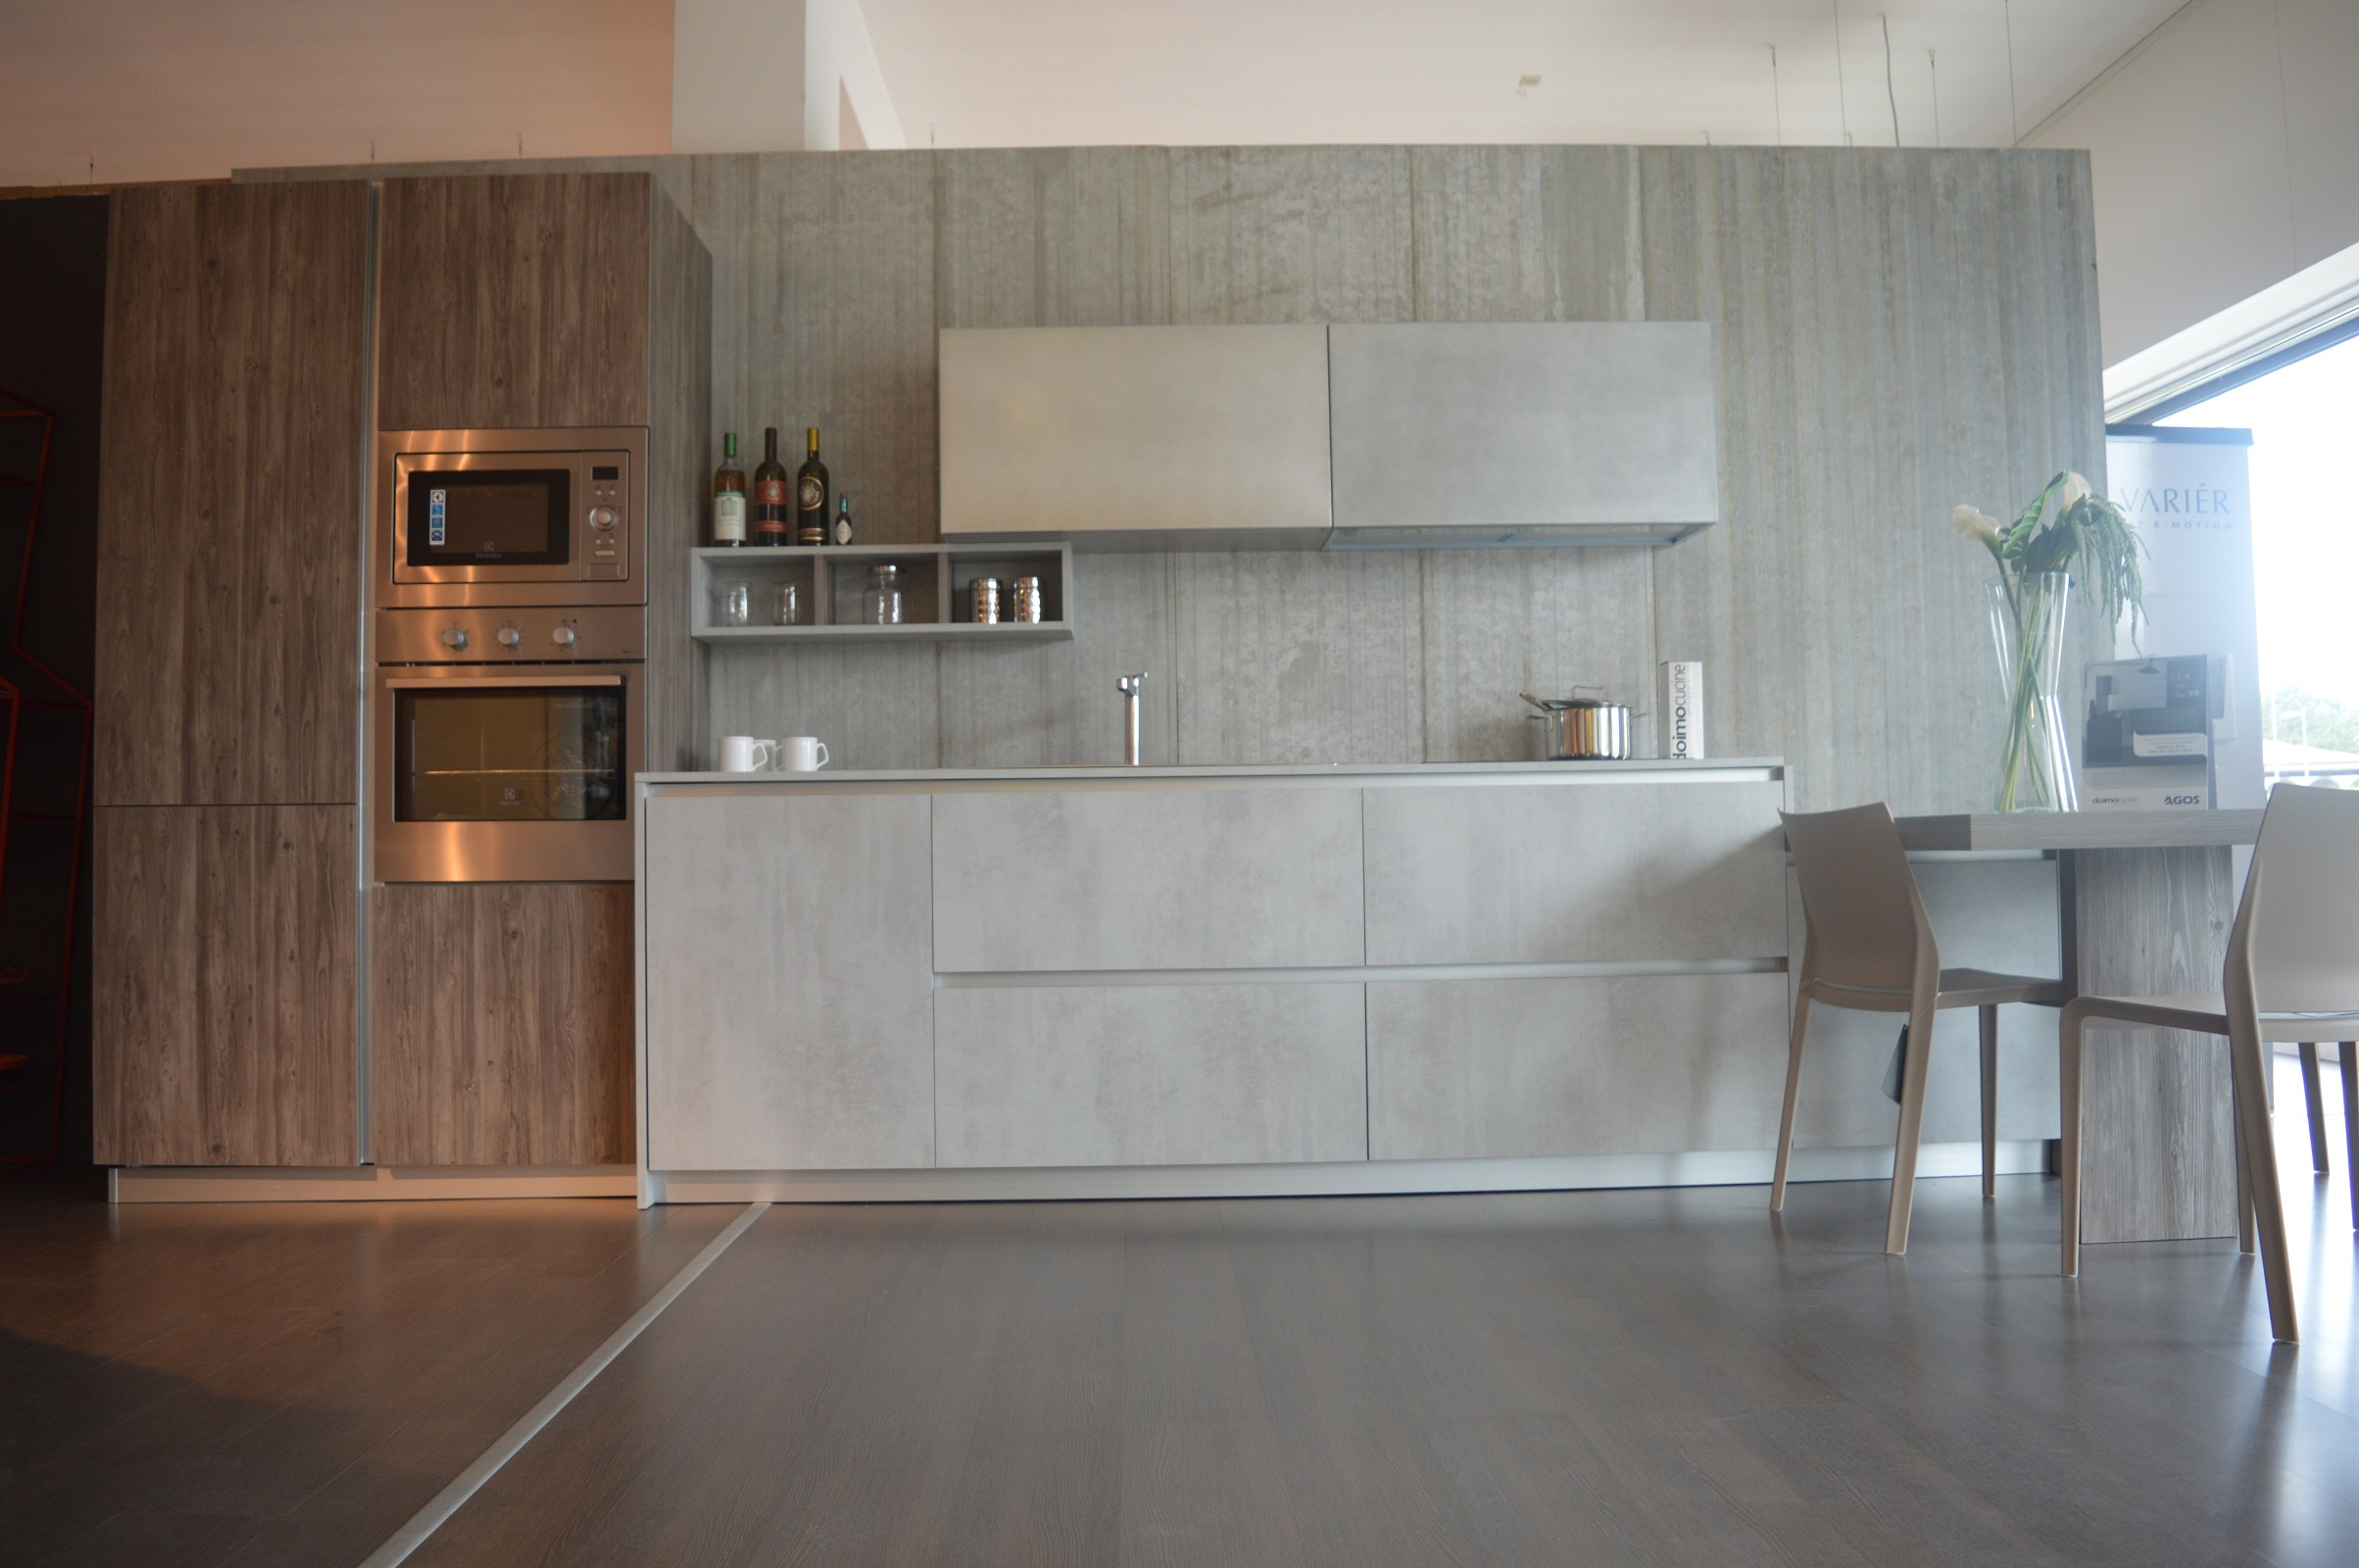 Doimo cucine cucina con penisola easy scontato del 30 for Doimo cucine bolzano